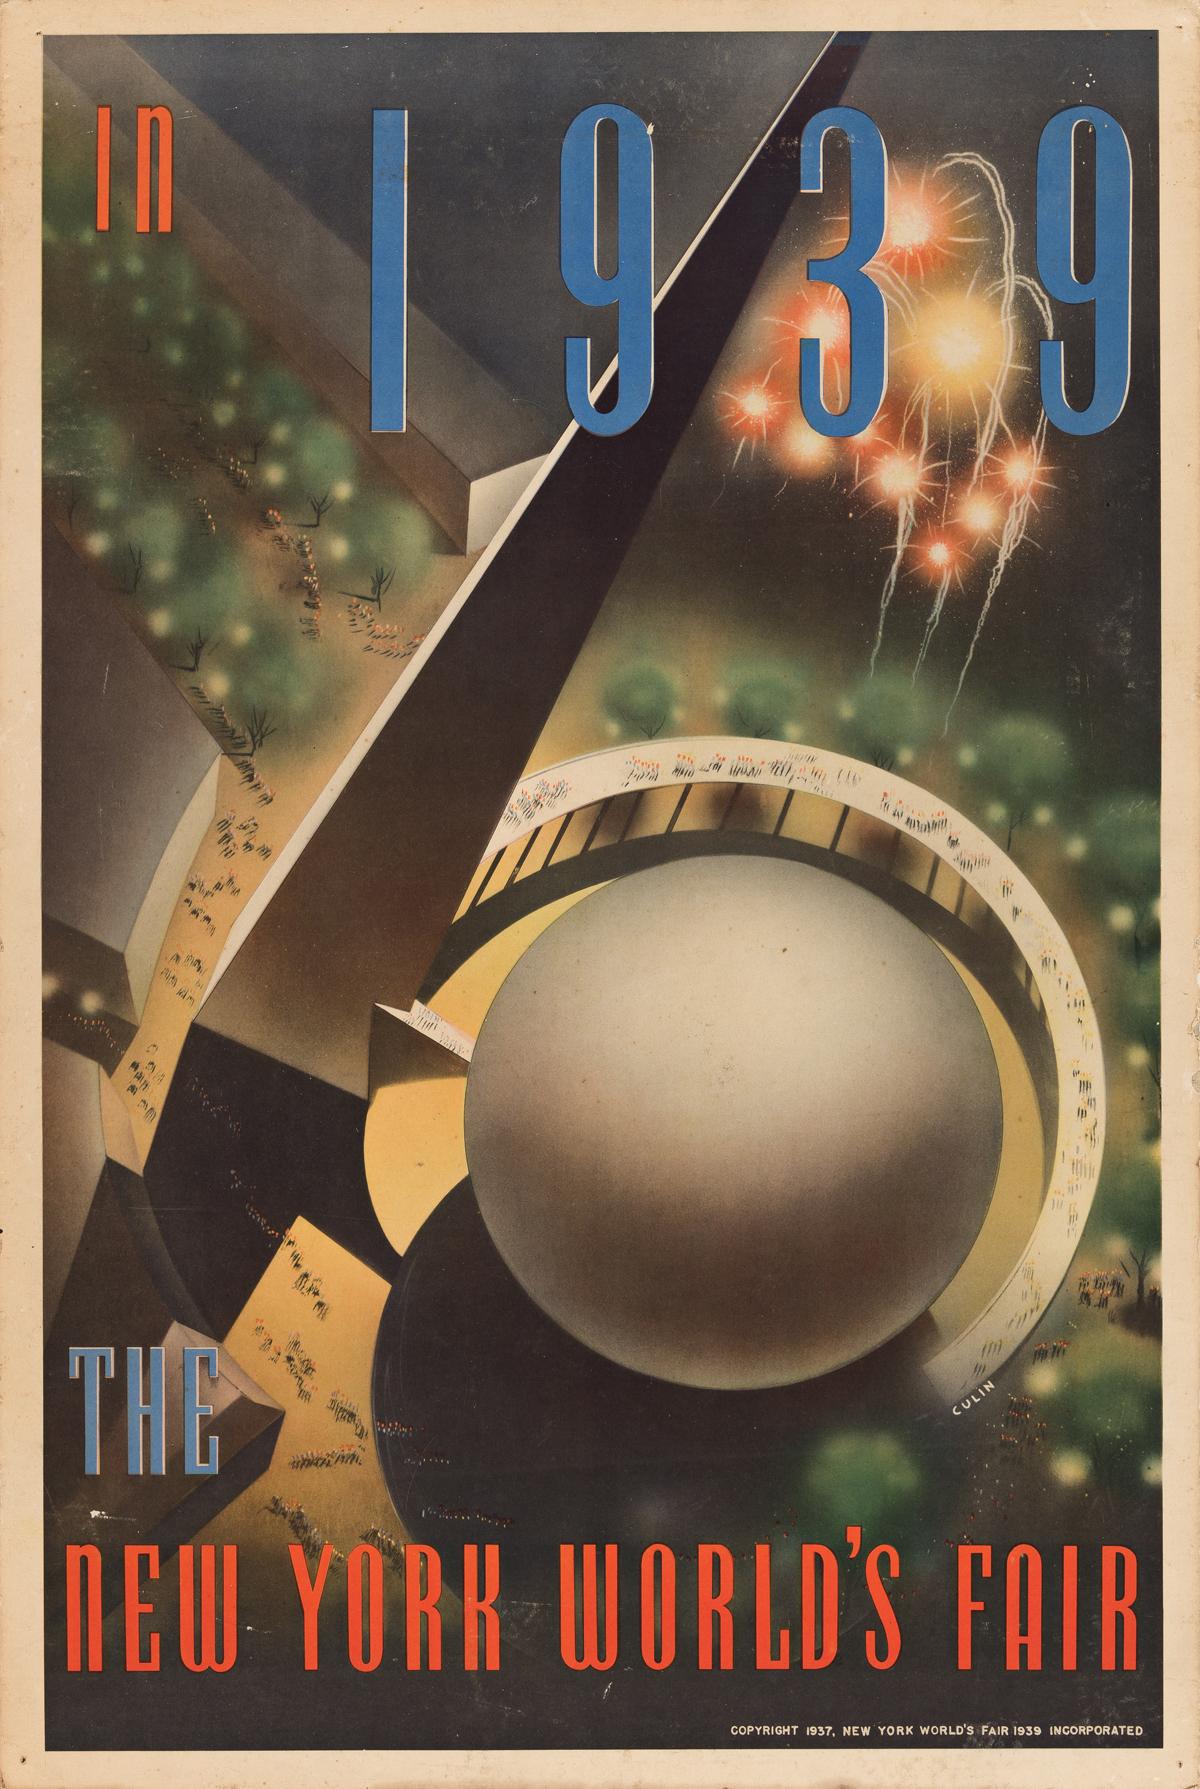 NEMBHARD N. CULIN (1908-1990).  IN 1939 / THE NEW YORK WORLDS FAIR. 1937. 30x20 inches, 76x50¾ cm.